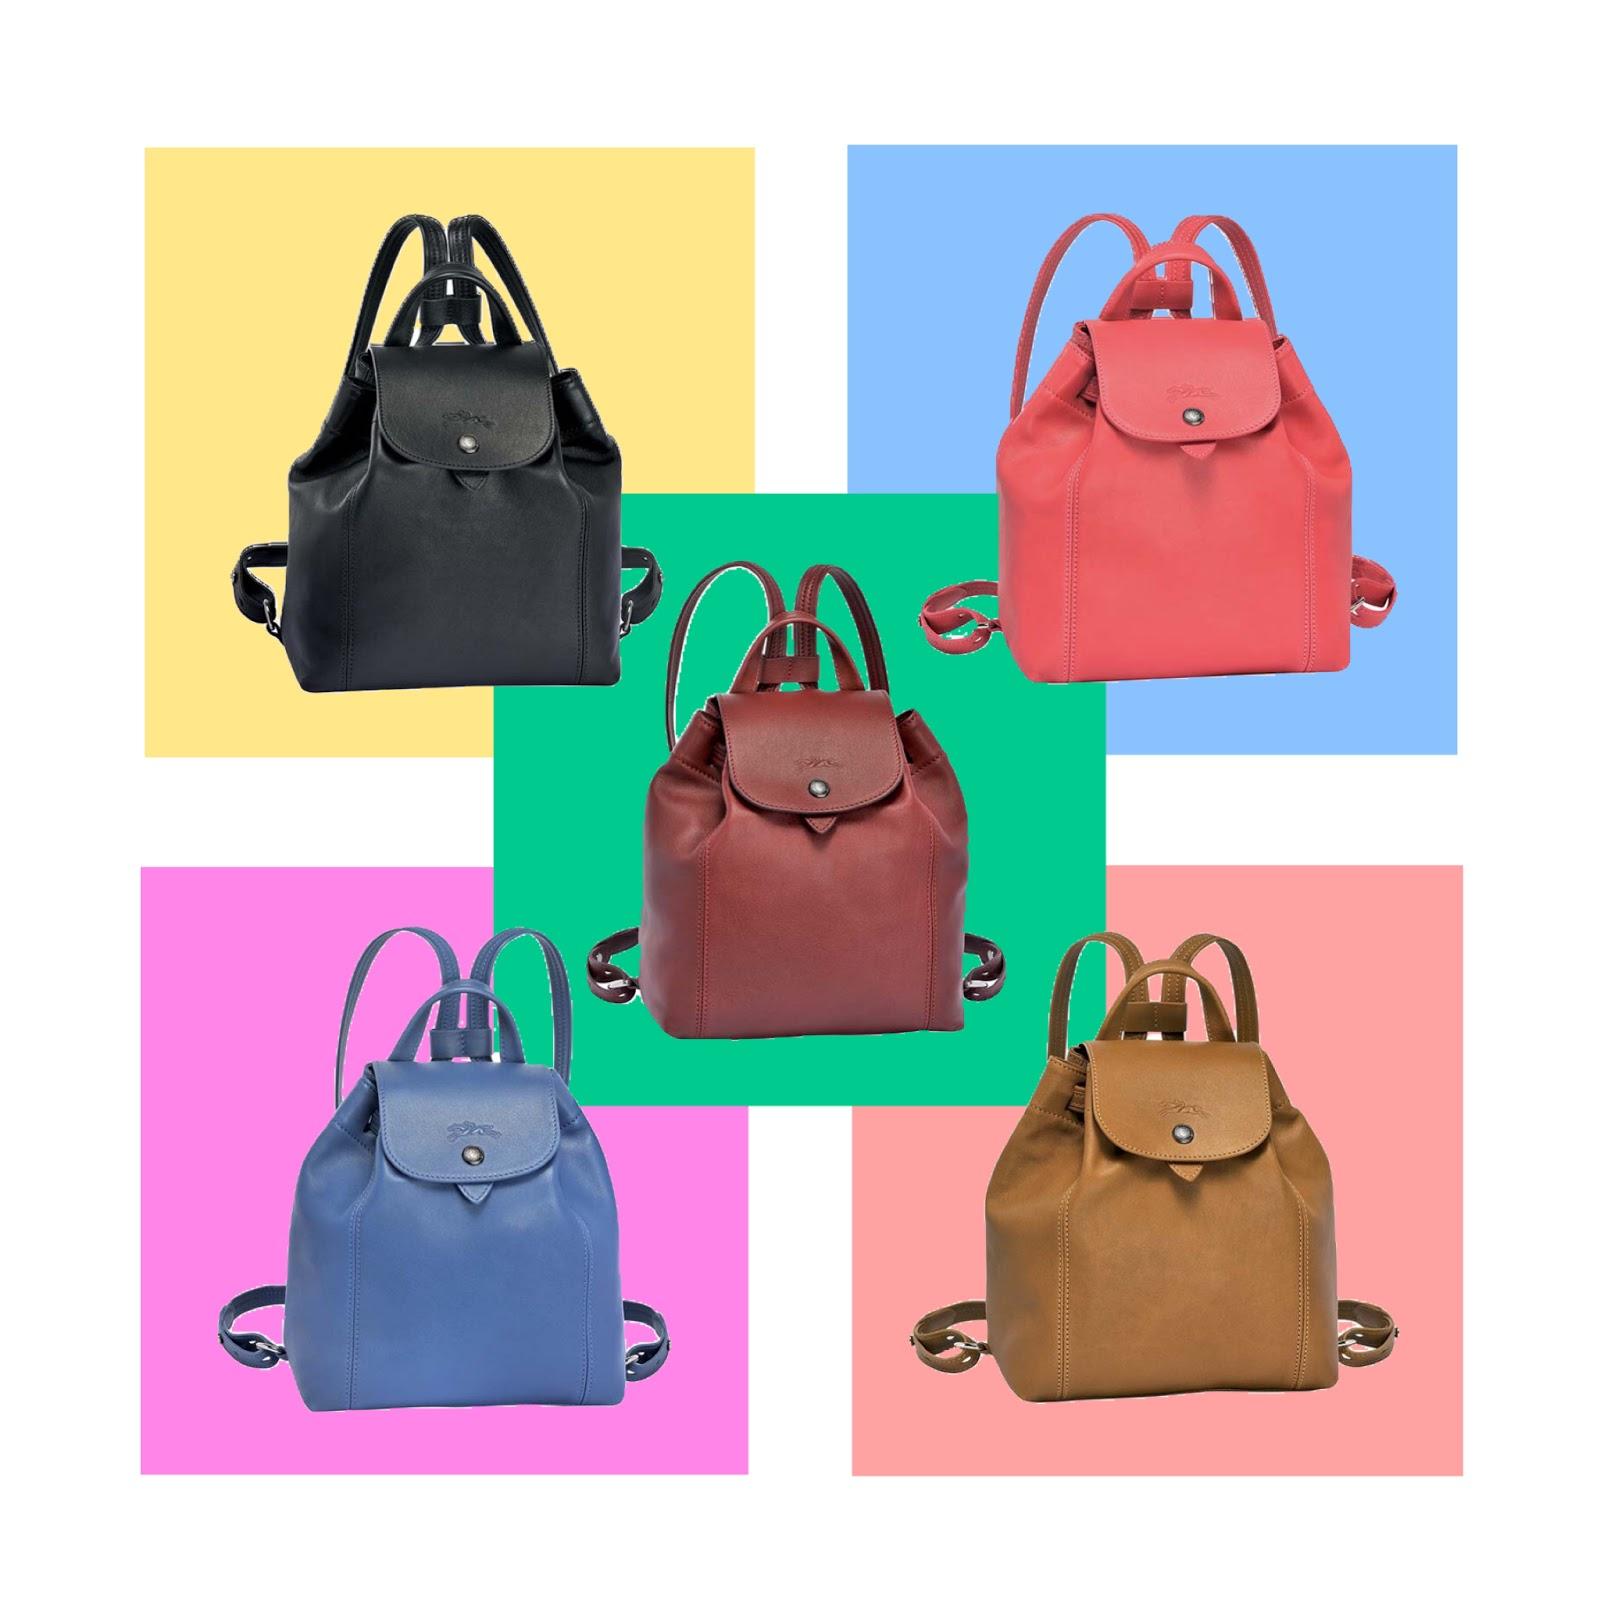 Longchamp Le Pliage Bag Designer Handbag Illustration Cocarde Crossbody Navy Cuir Backpack Xs